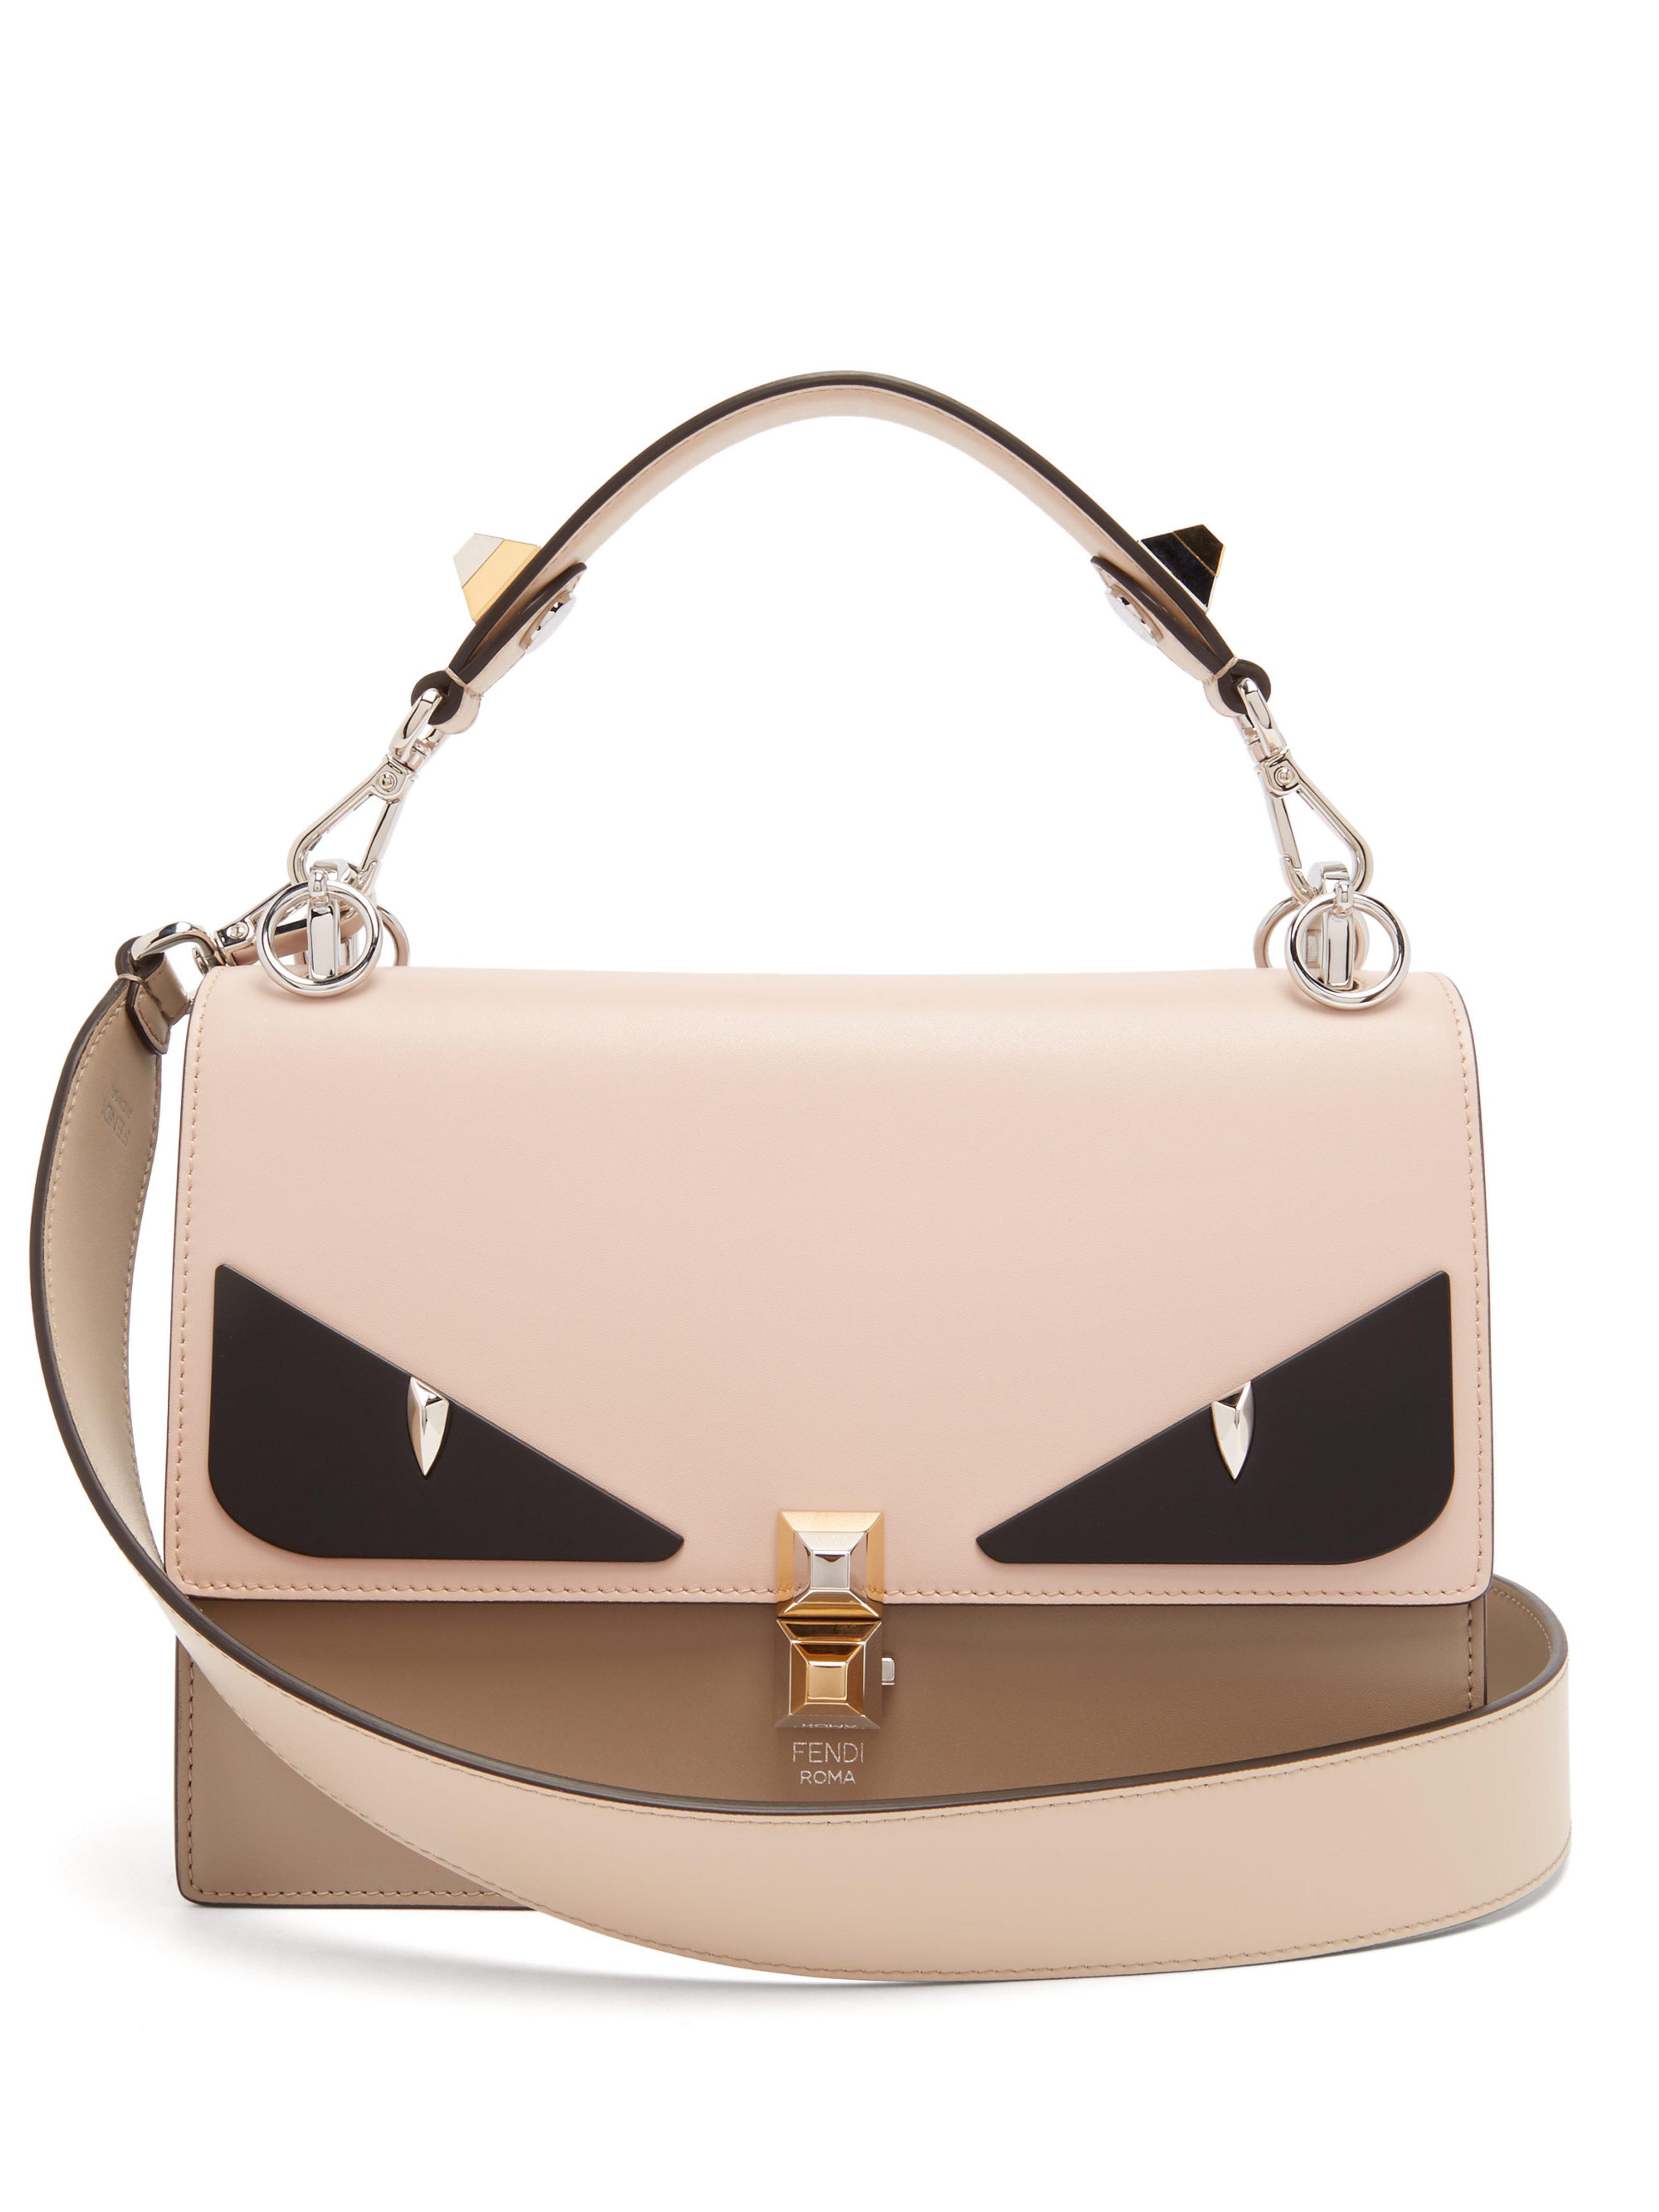 151748900920 Fendi Kan I Monster Eyes Leather Bag - Save 36% - Lyst